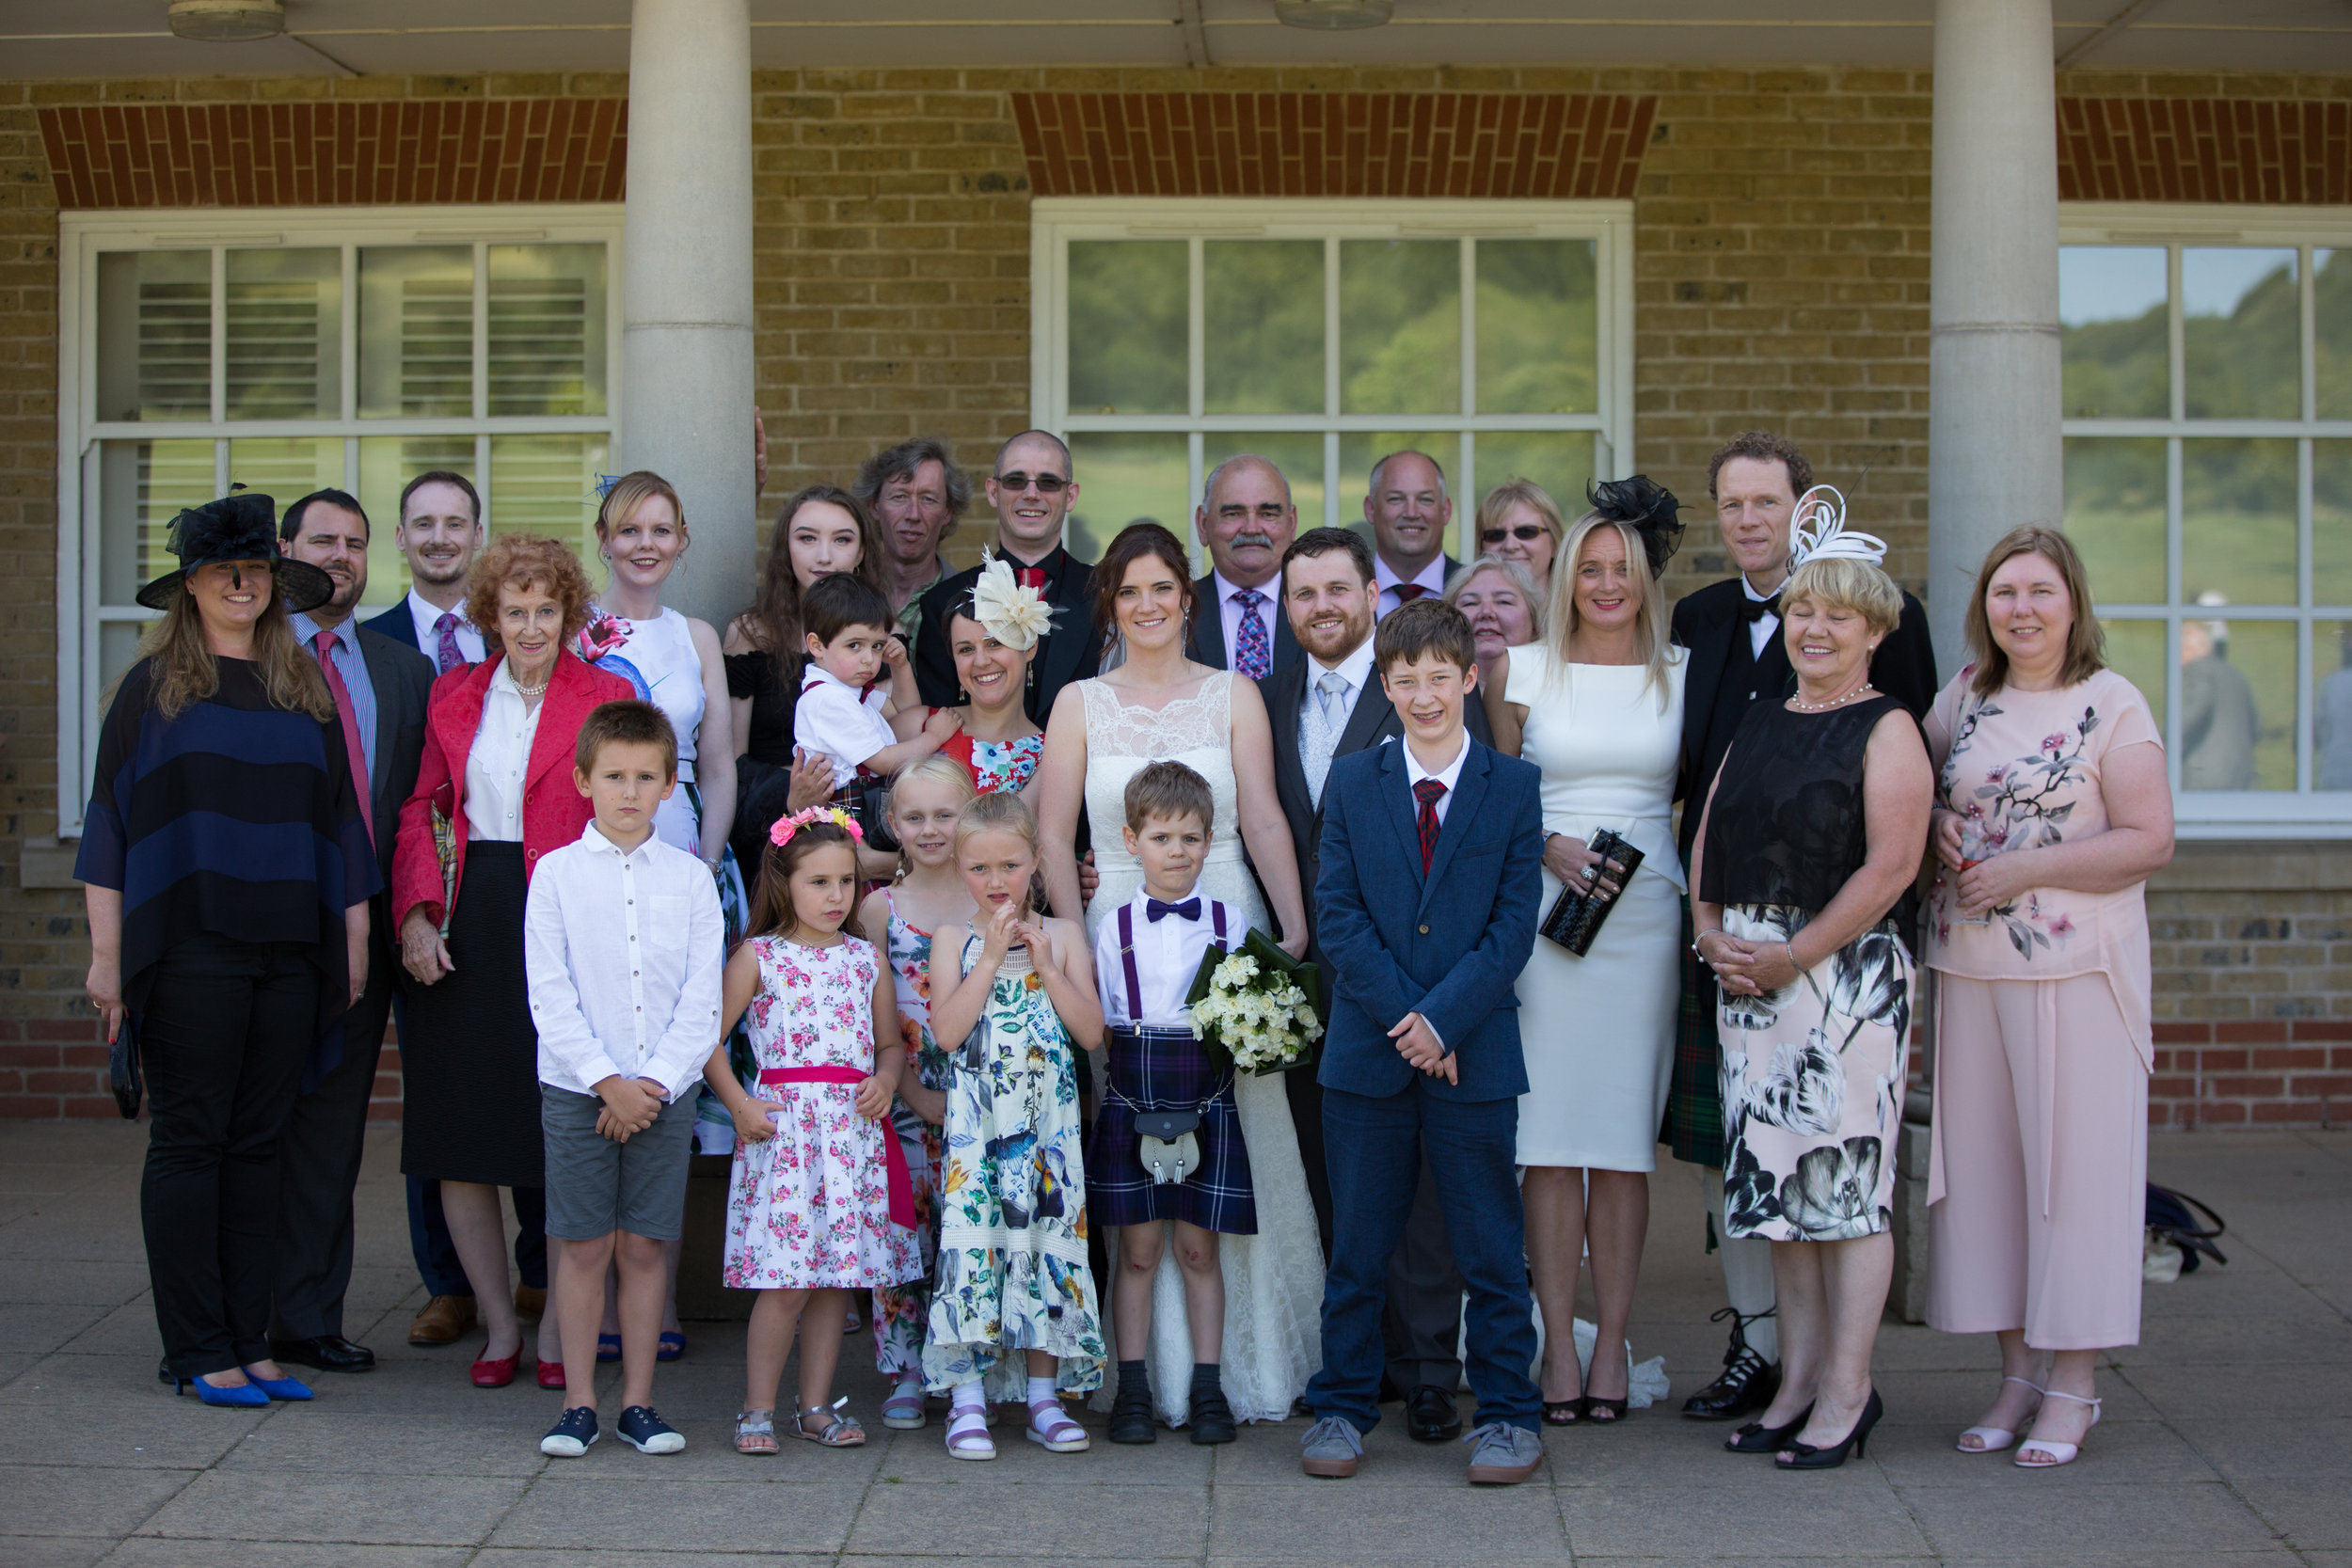 reigate-surrey-london-wedding-photography-group-formal-shot-75